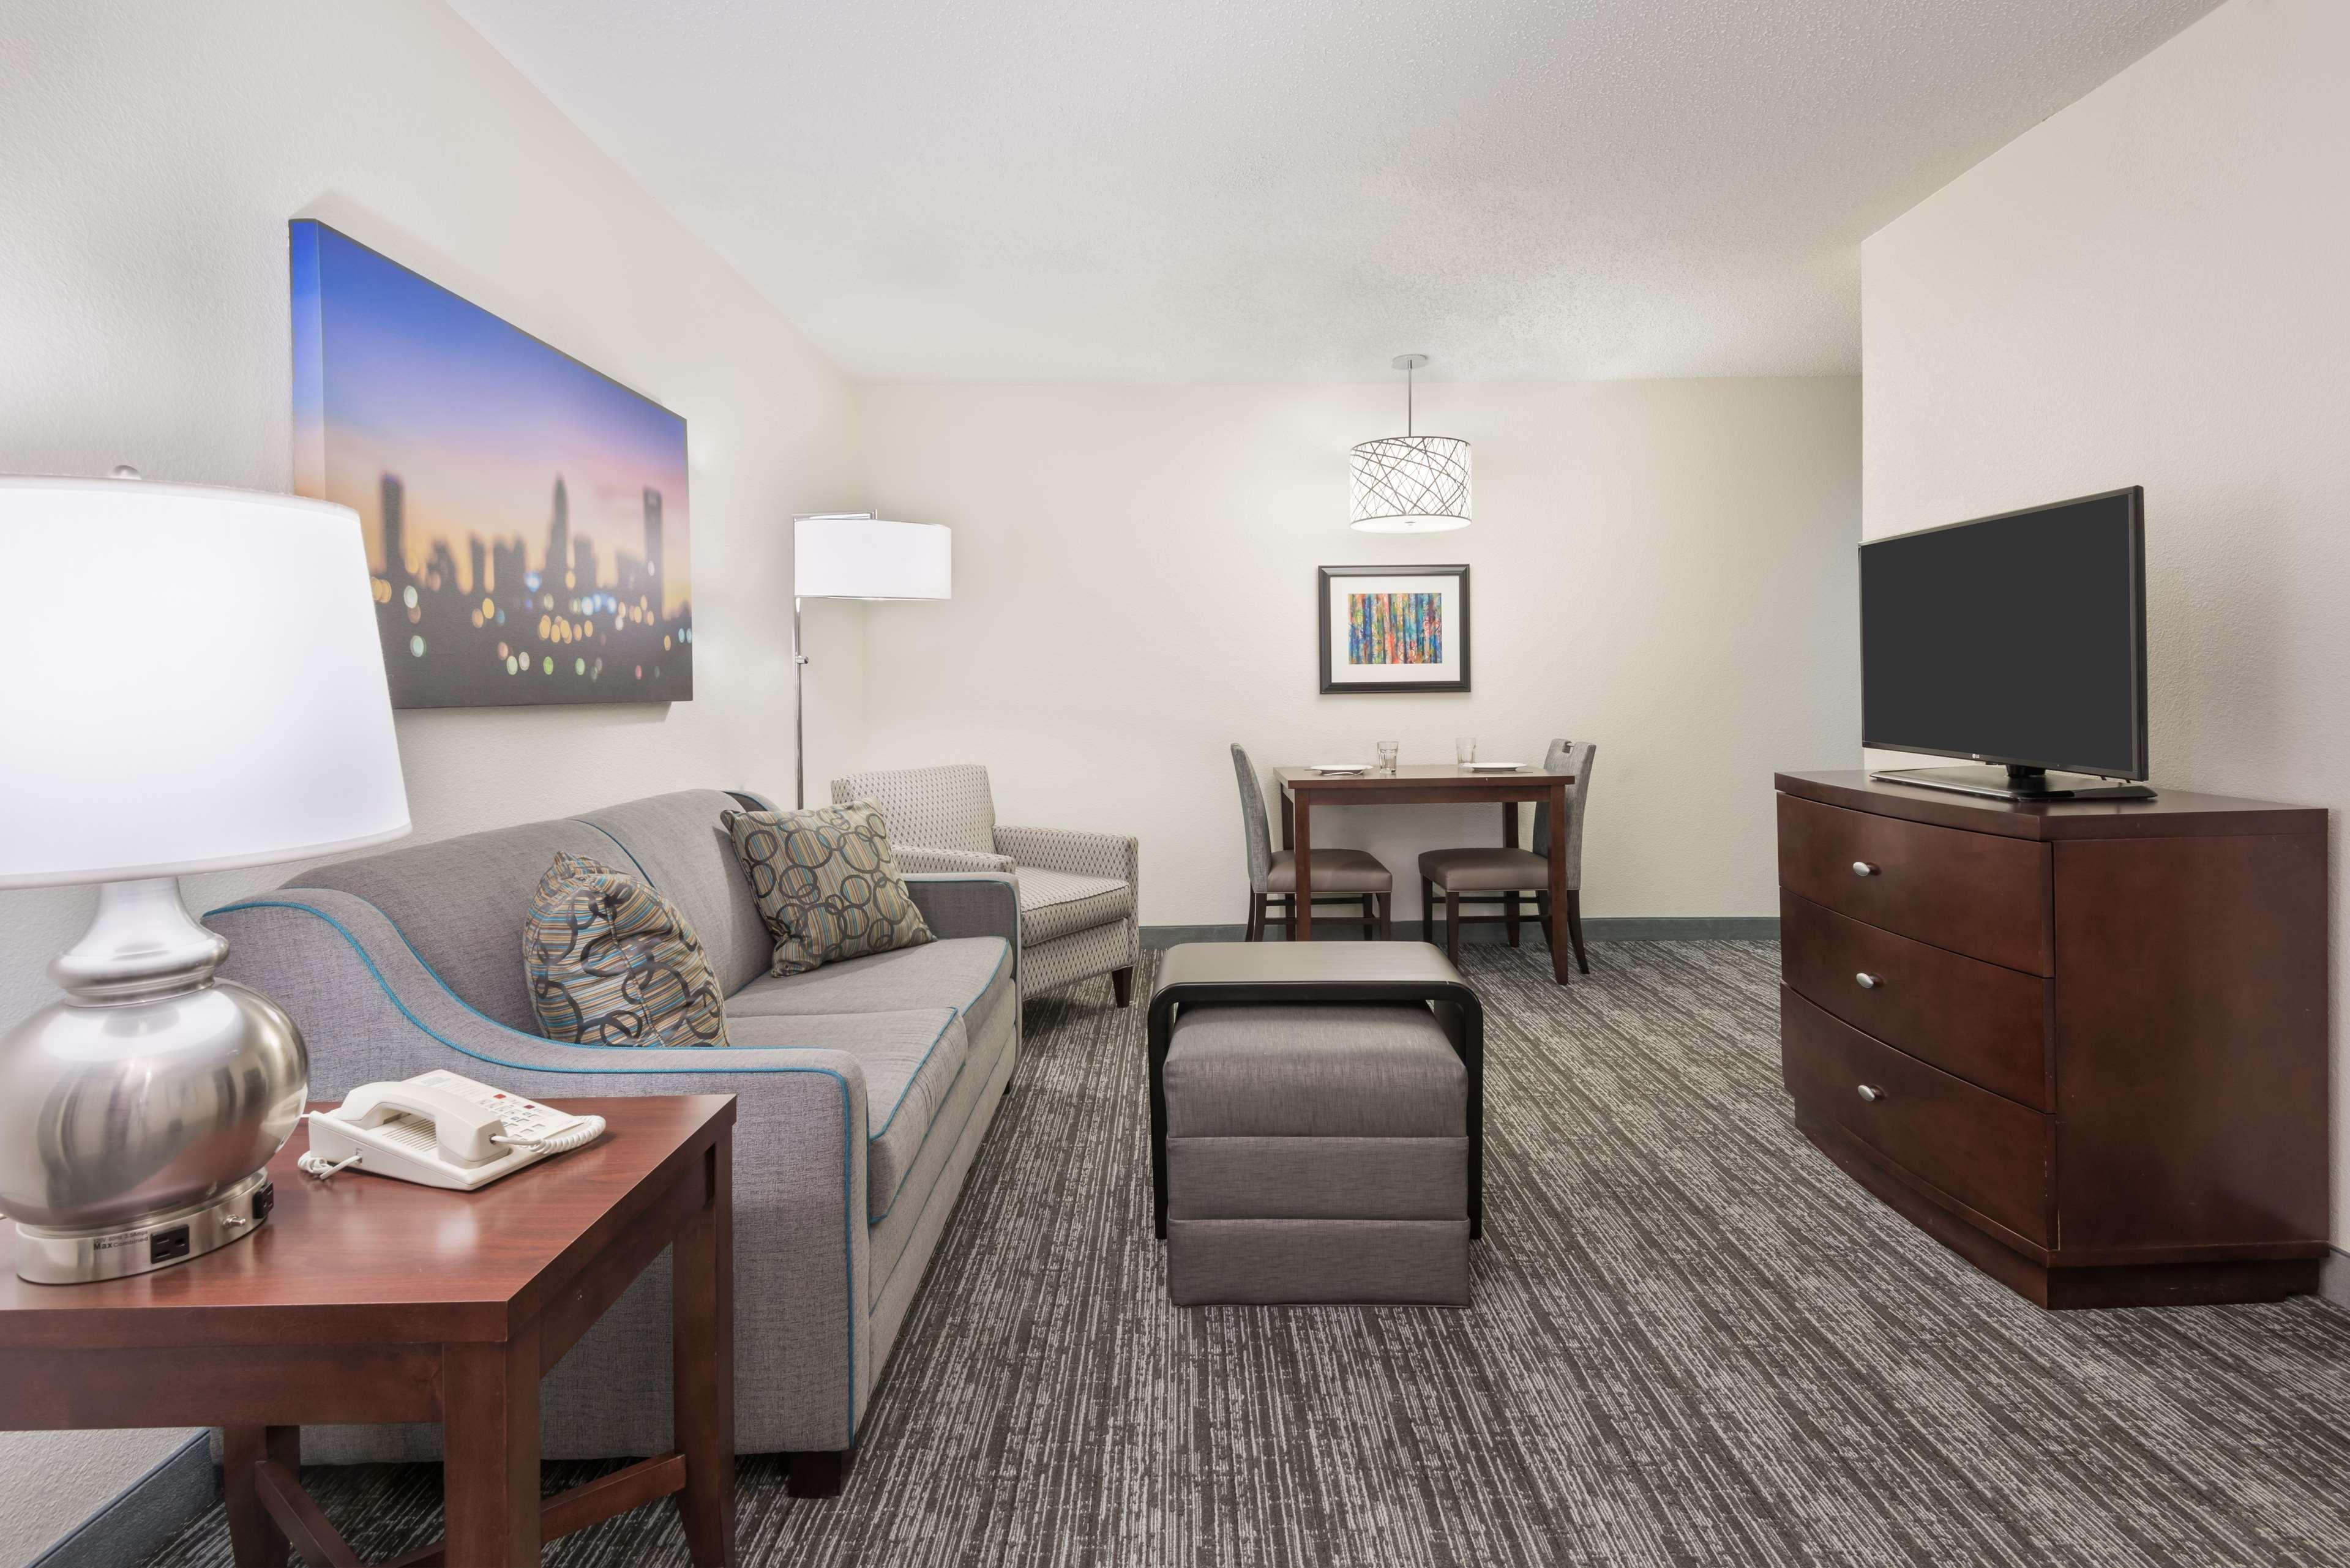 Homewood Suites by Hilton Charlotte-North/Univ Research Park image 12